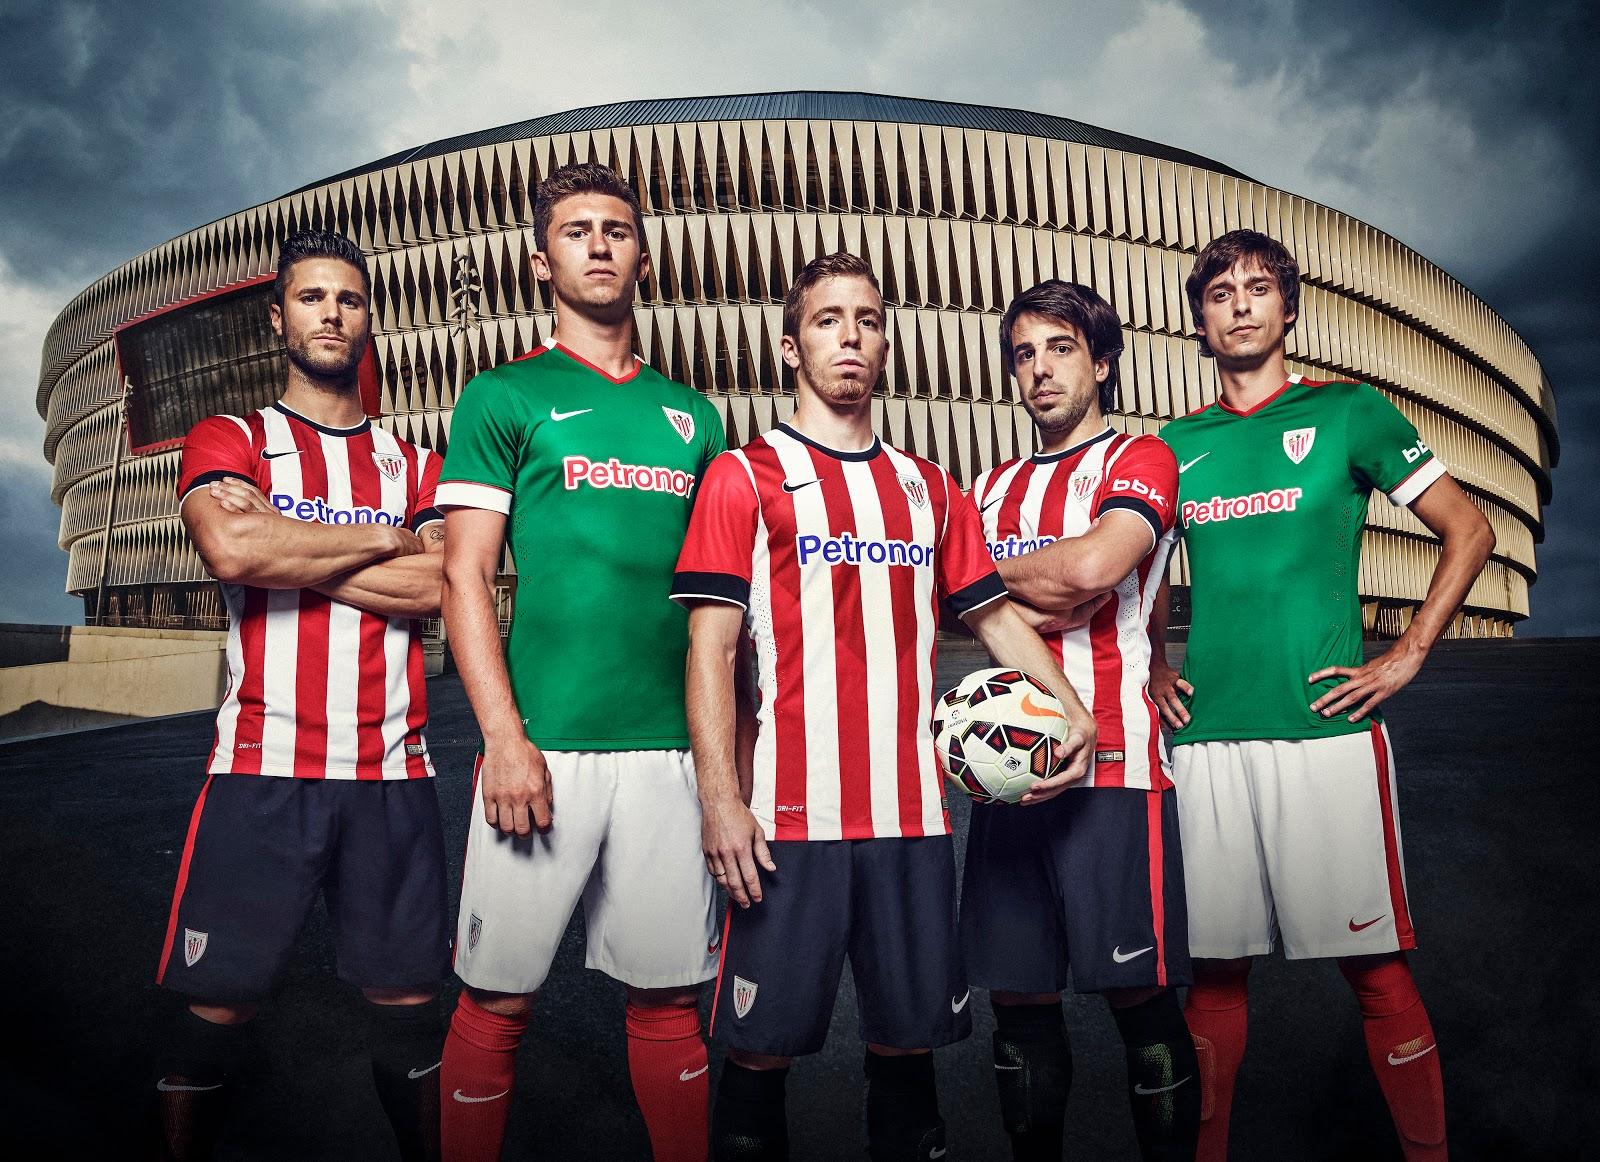 Atletico Bilbao